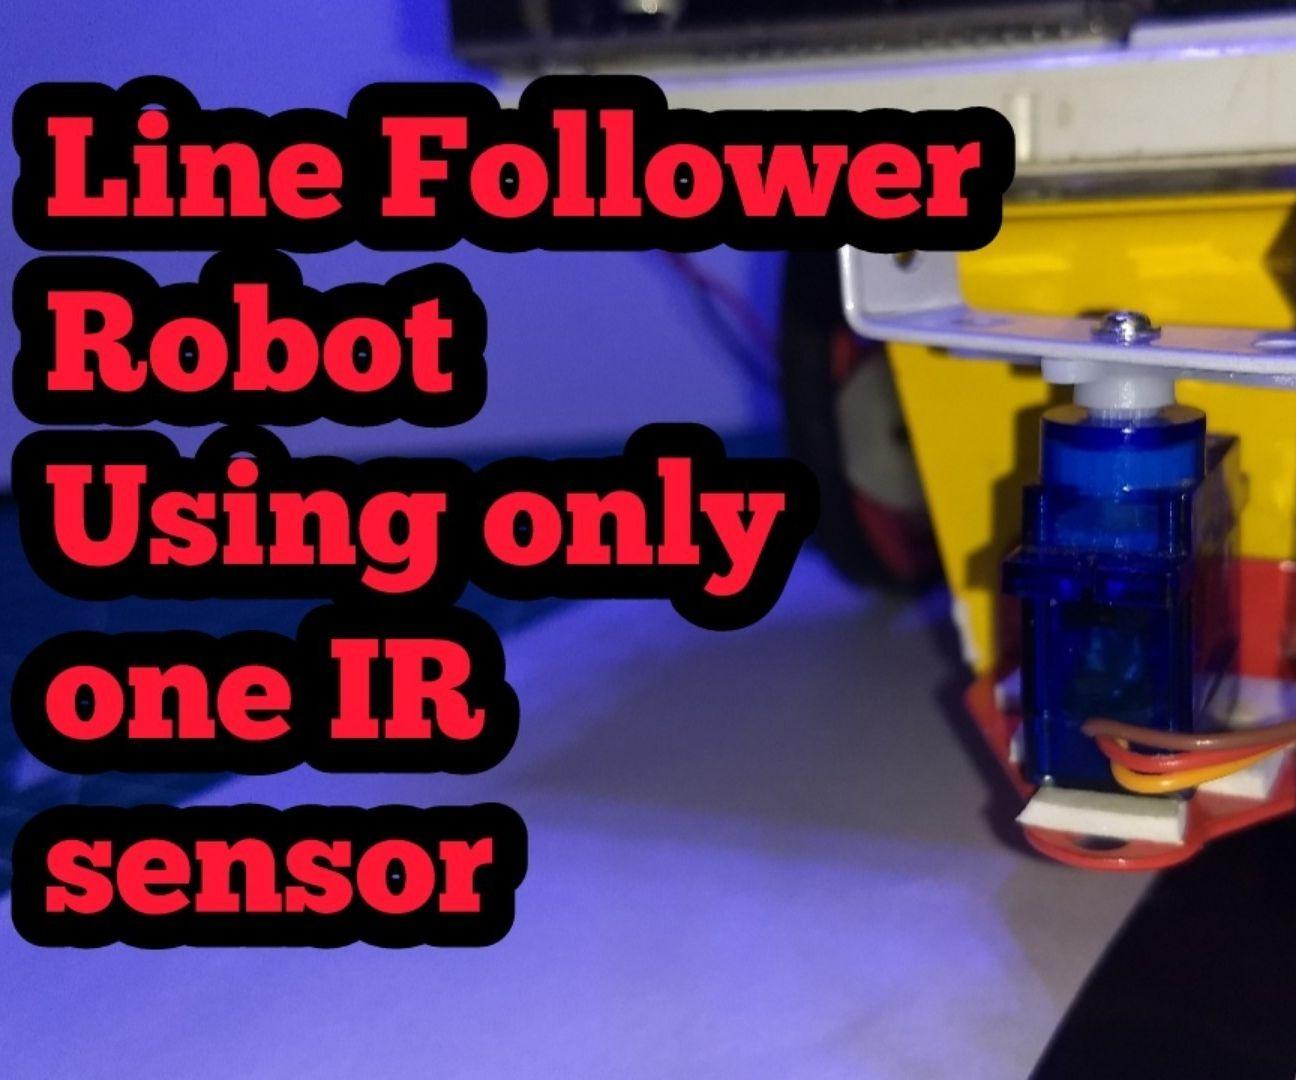 Line Follower Robot Using Only One Sensor